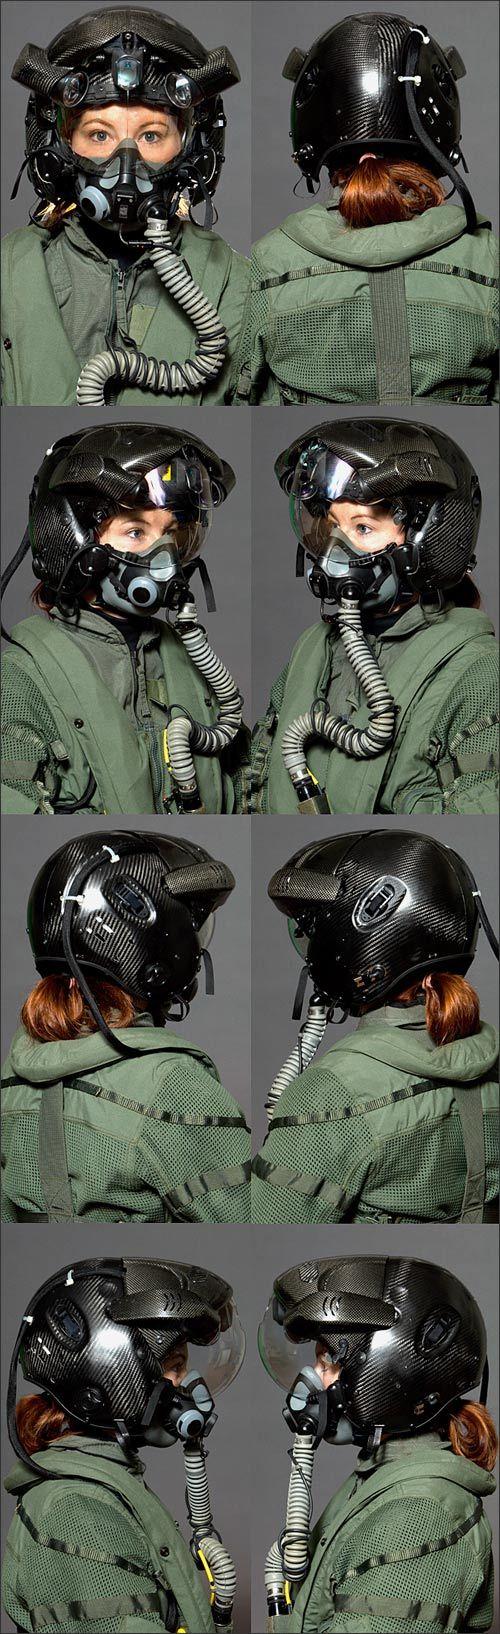 wicked cool F-35 helmet